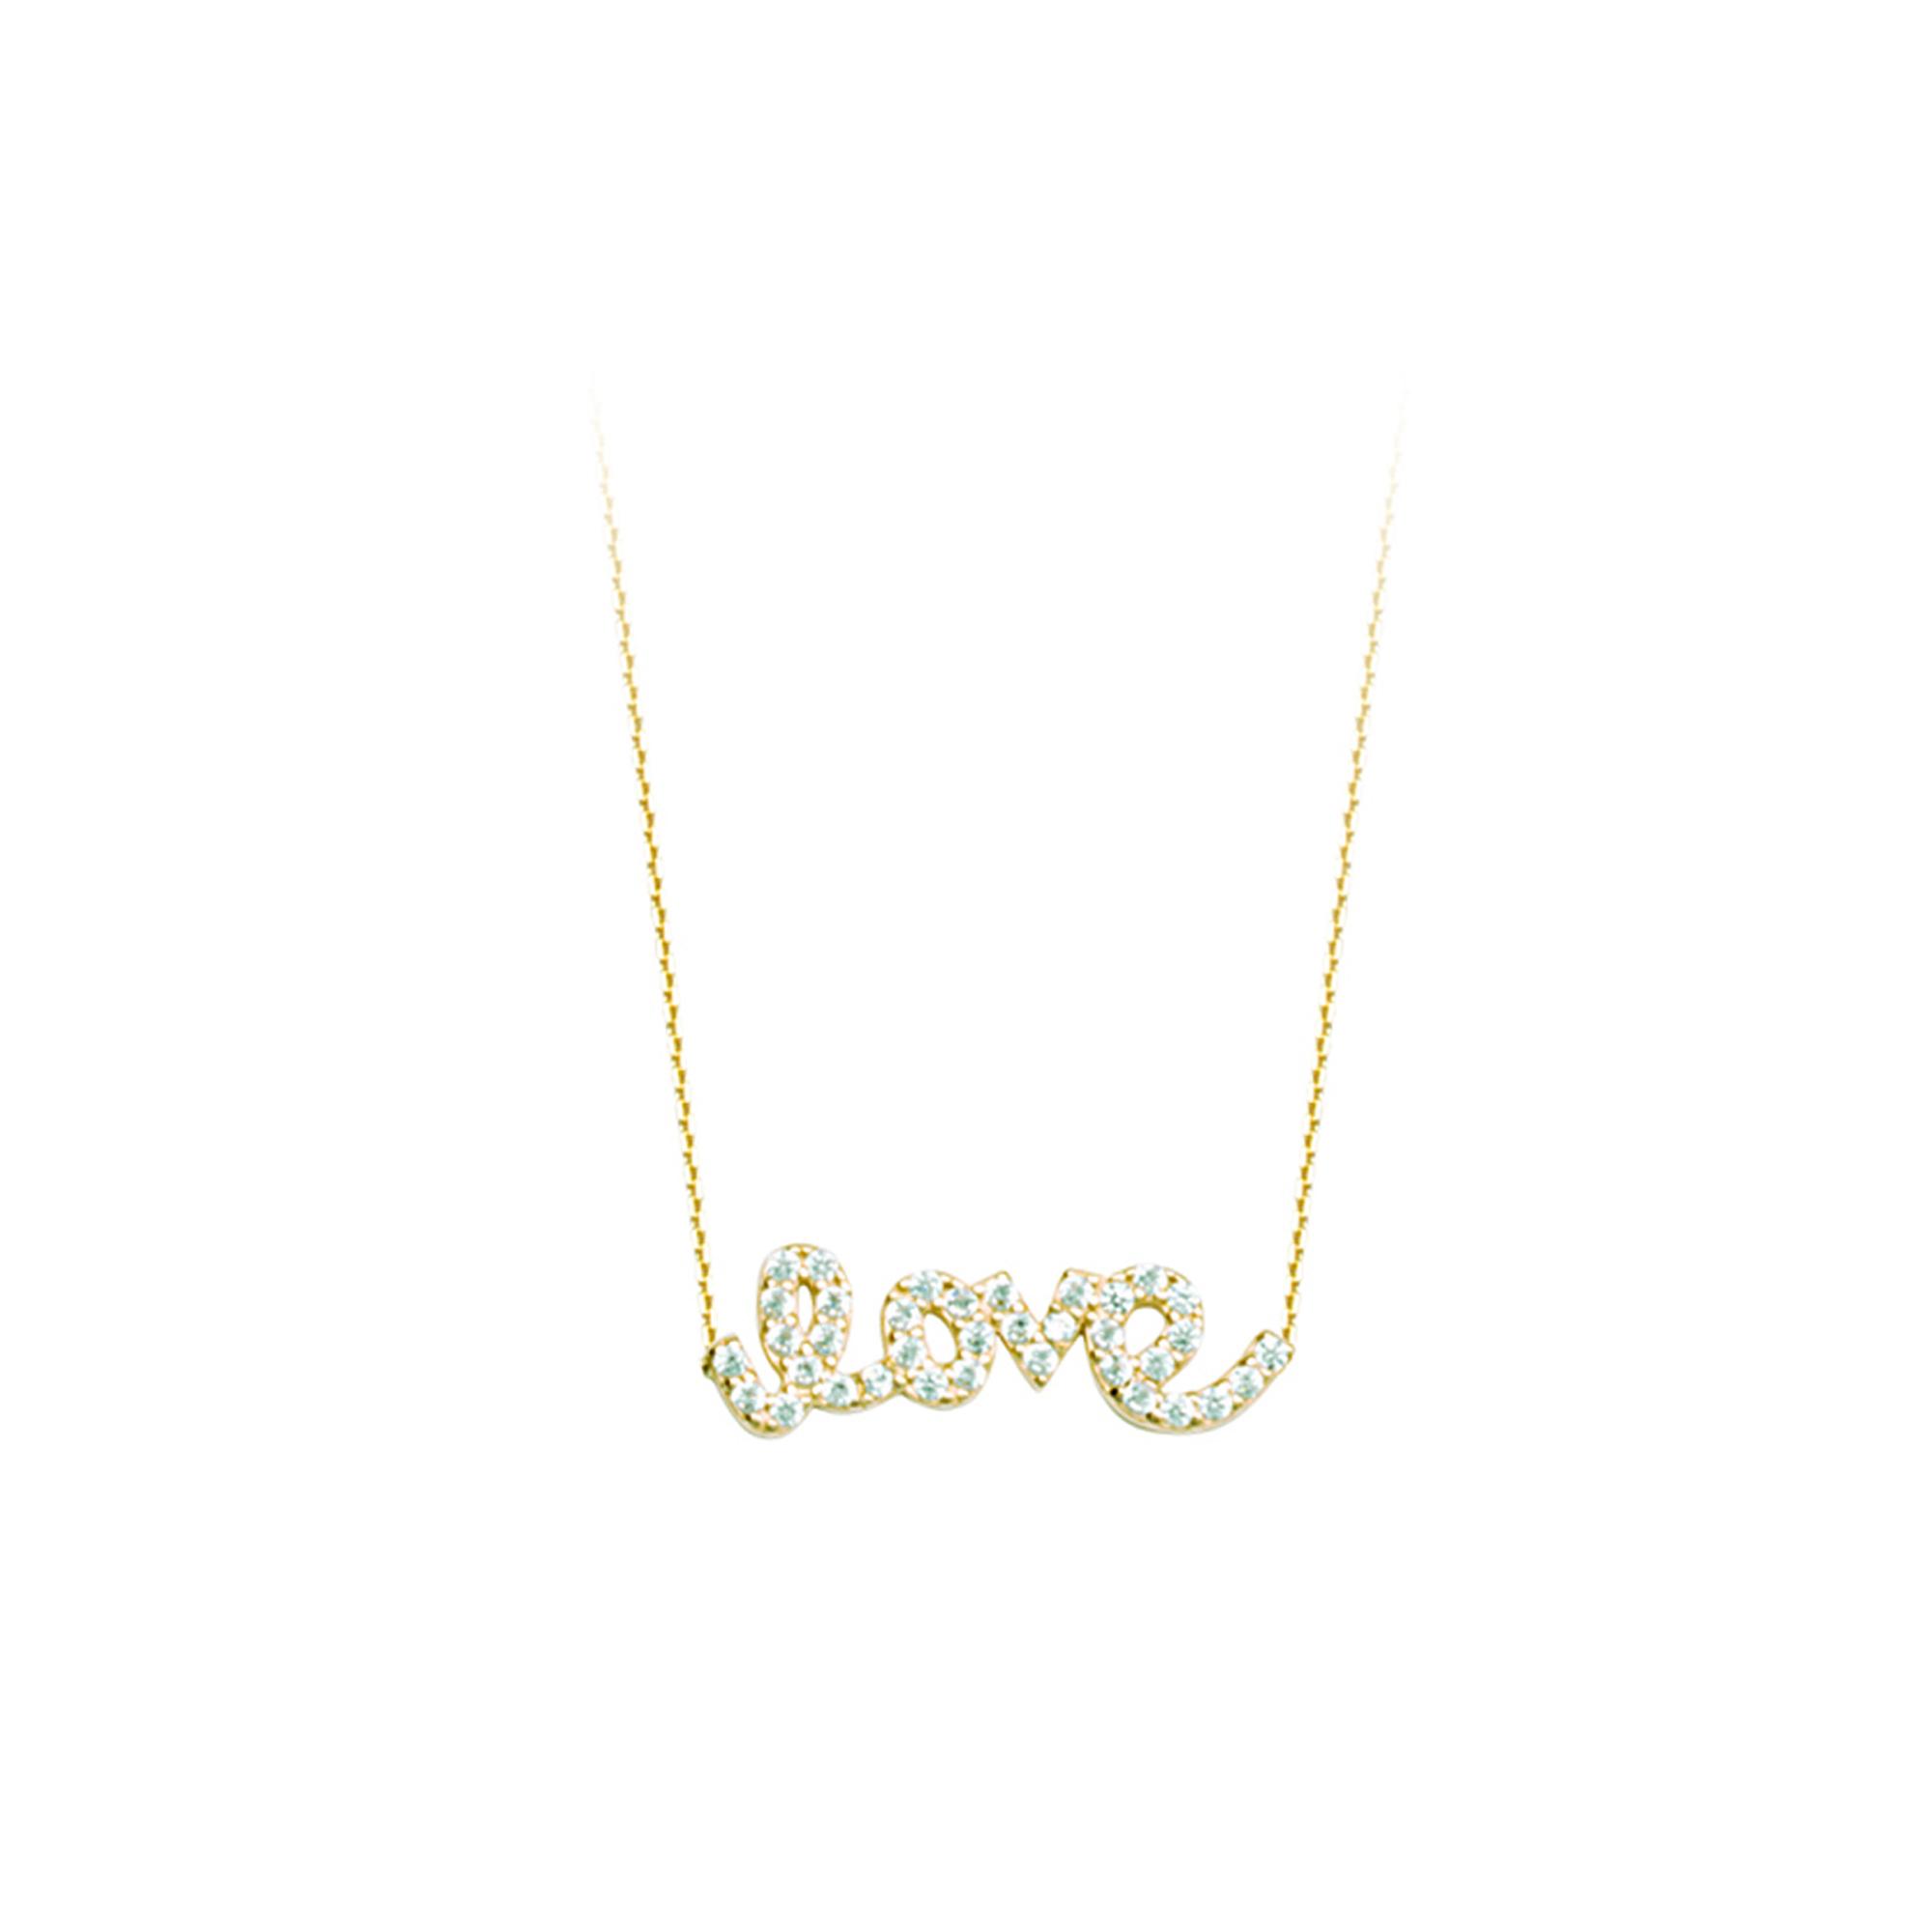 Love Necklace, 14Kt Gold  & Cz Love Necklace 18